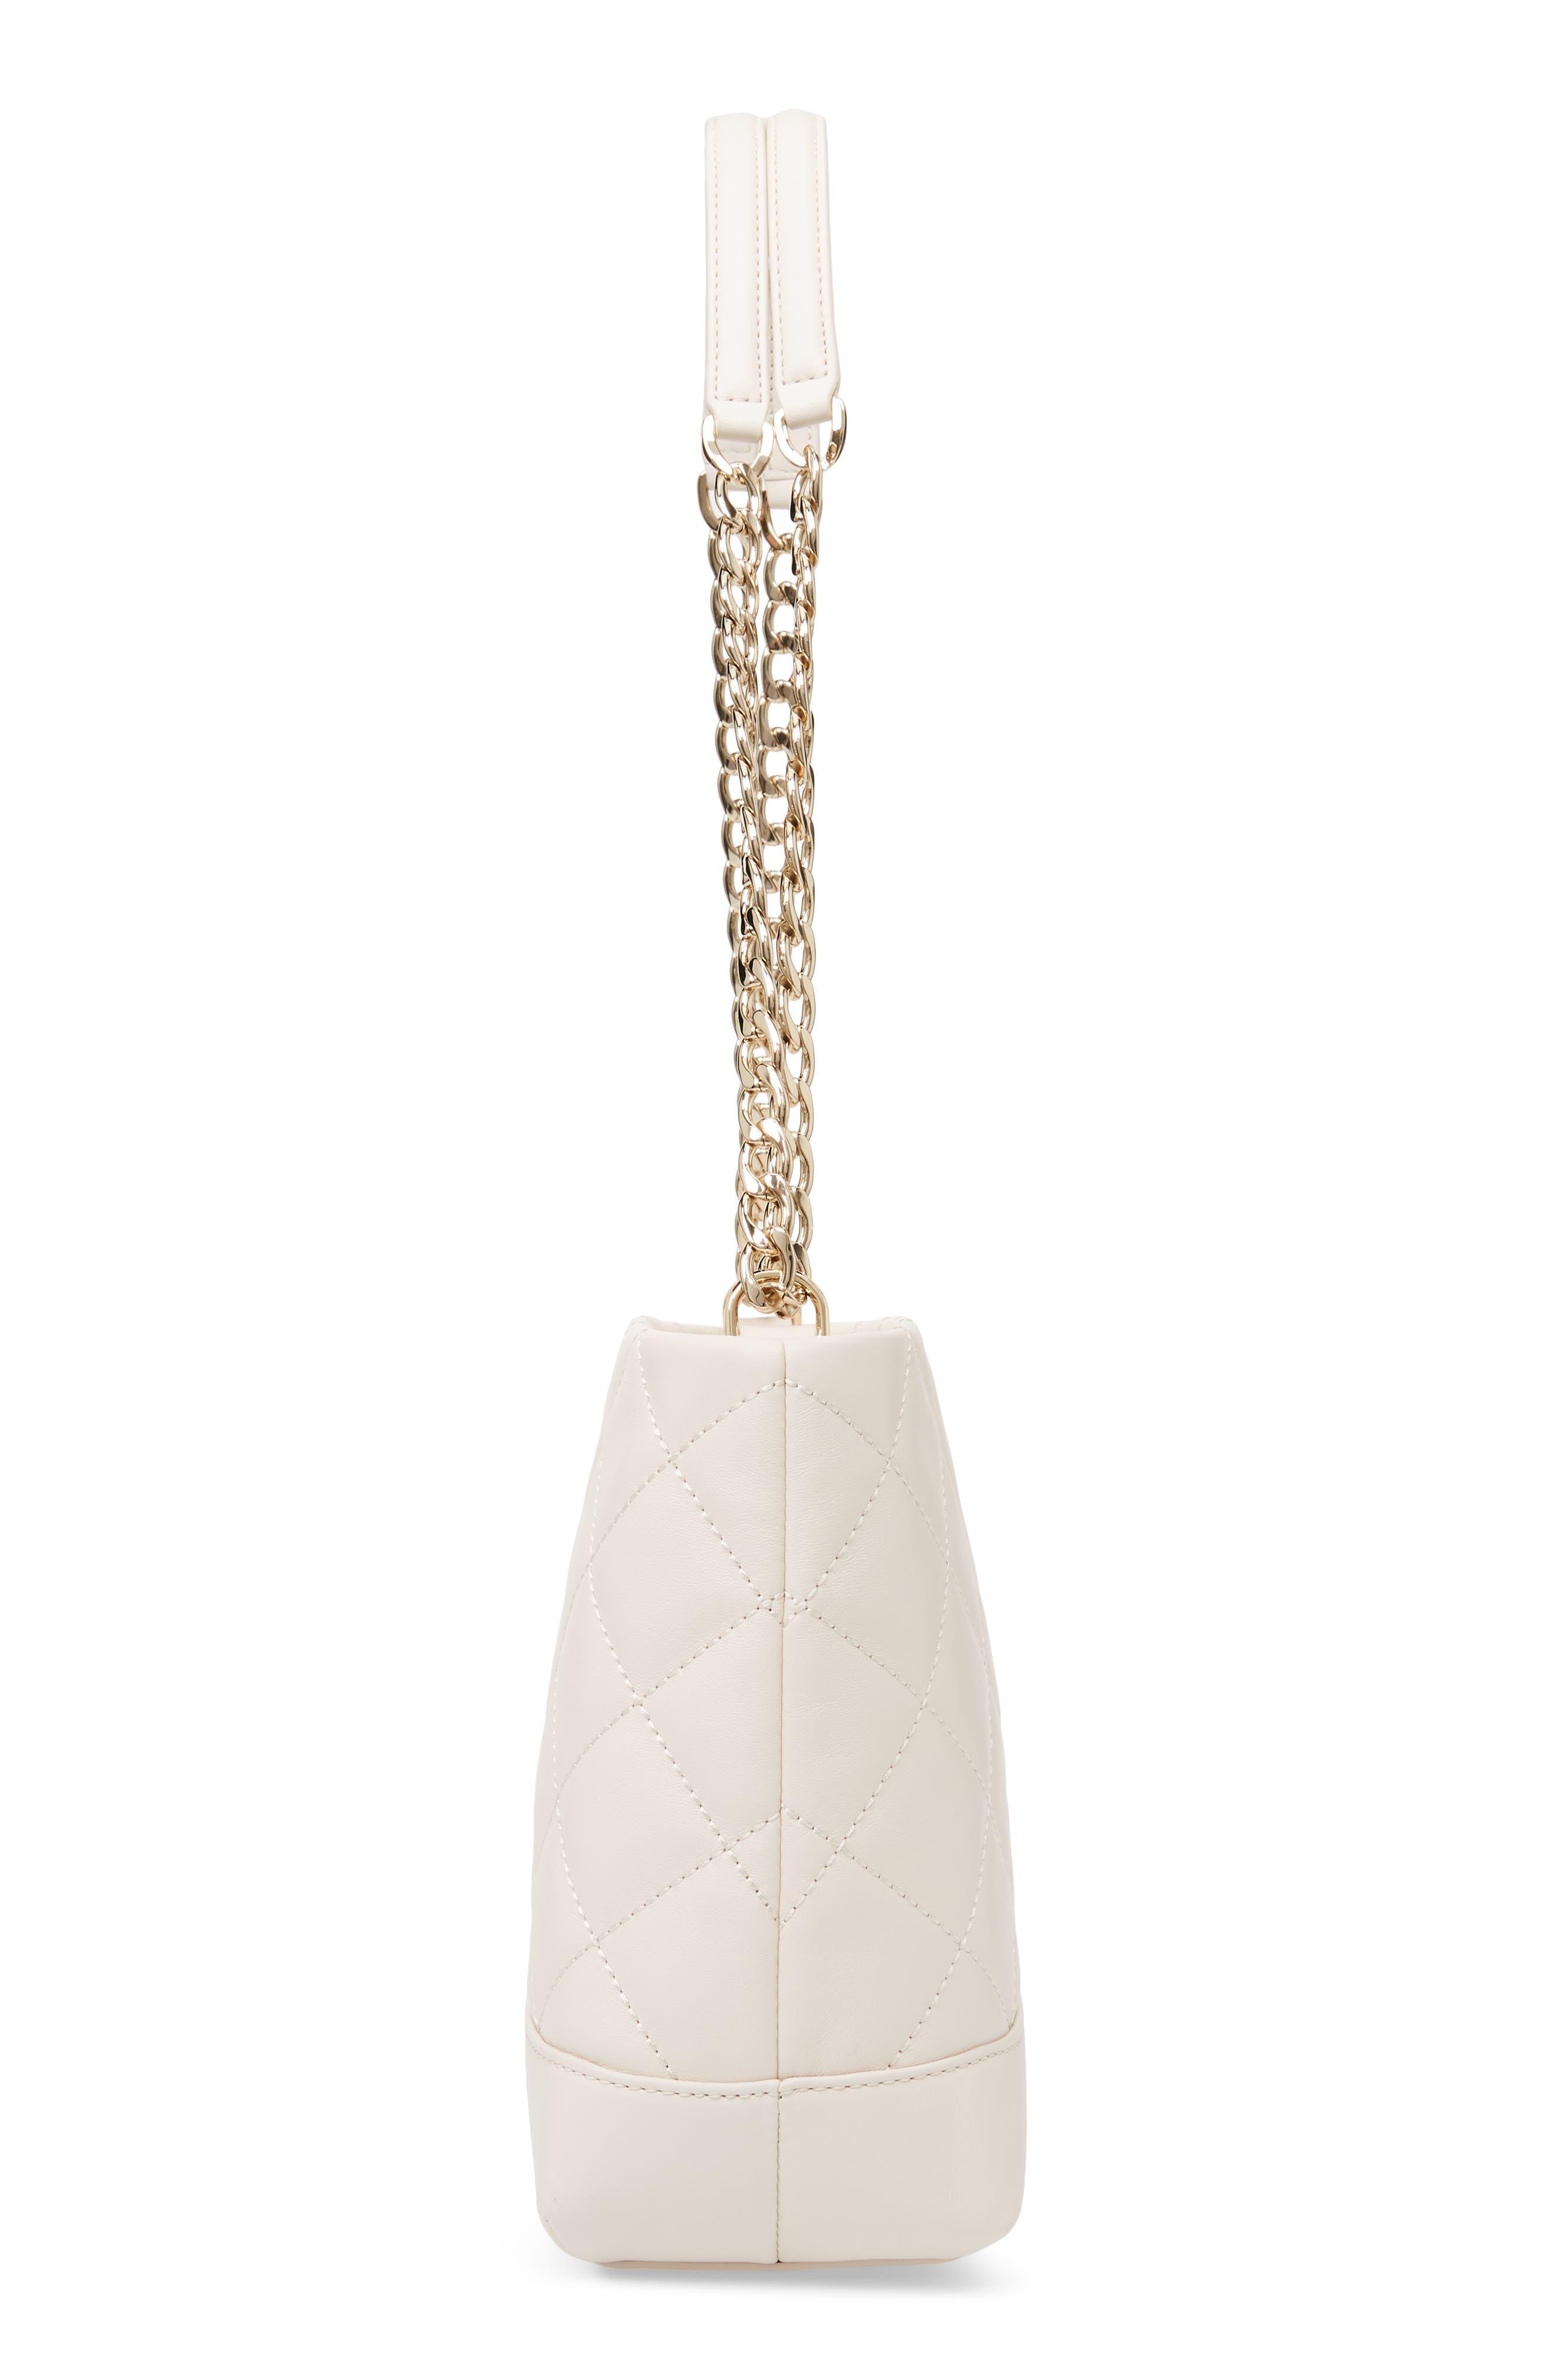 emerson place lorie quilted leather shoulder bag,                             Alternate thumbnail 4, color,                             Bleach Bone